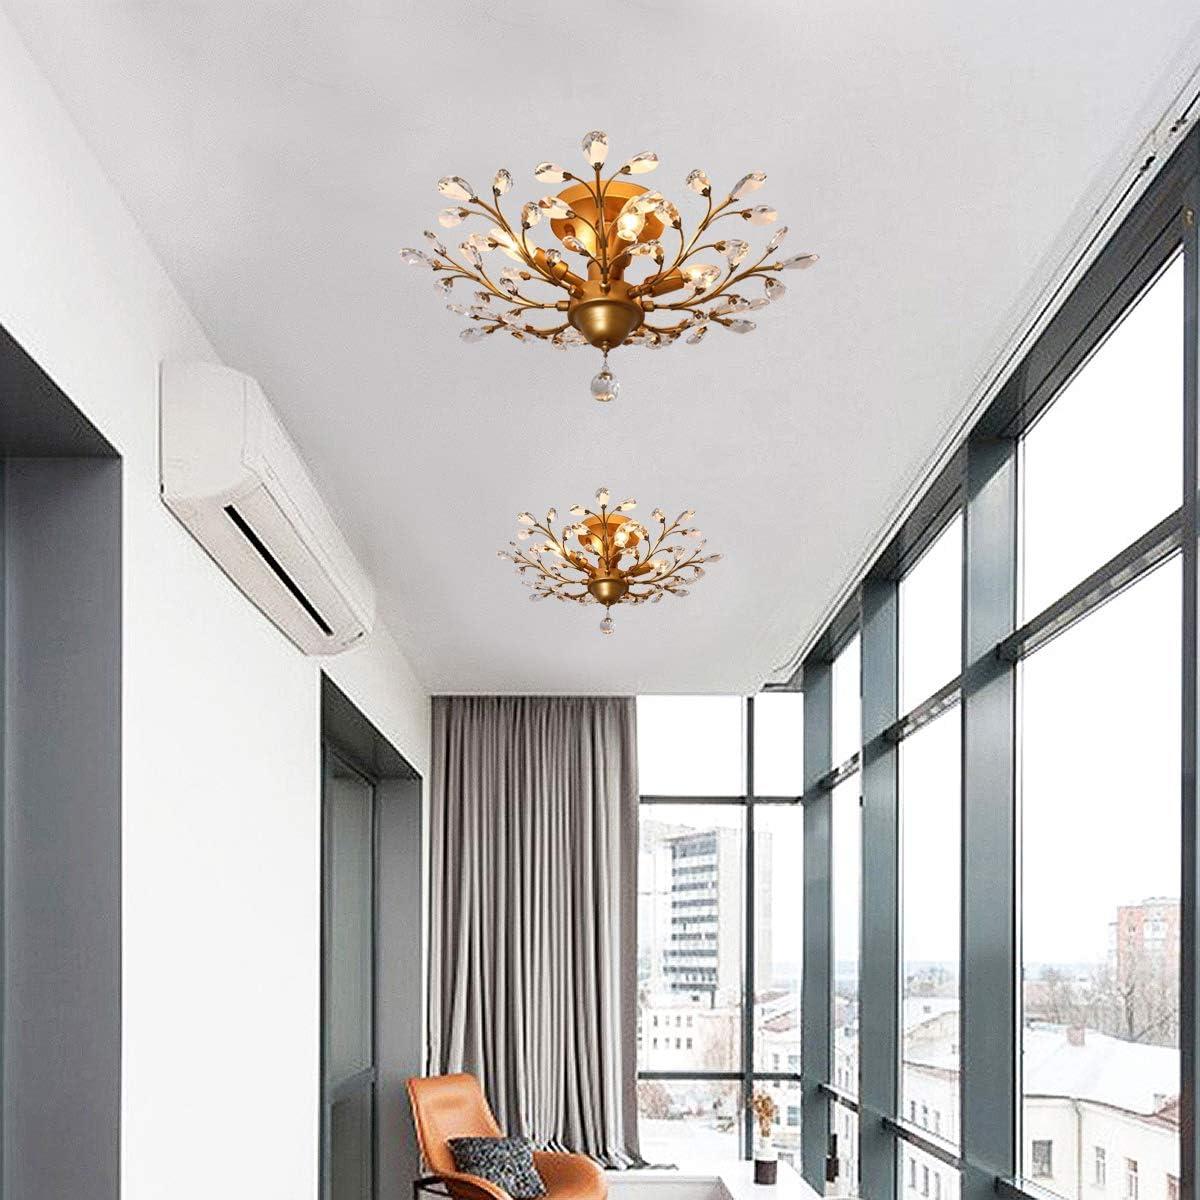 1-Light, Bronze LuFun Modern Crystal Chandeliers,Crystal Pendant Light,Chandelier Lighting Fixtures,Ceiling Light for Living Room Bedroom Restaurant Hallway